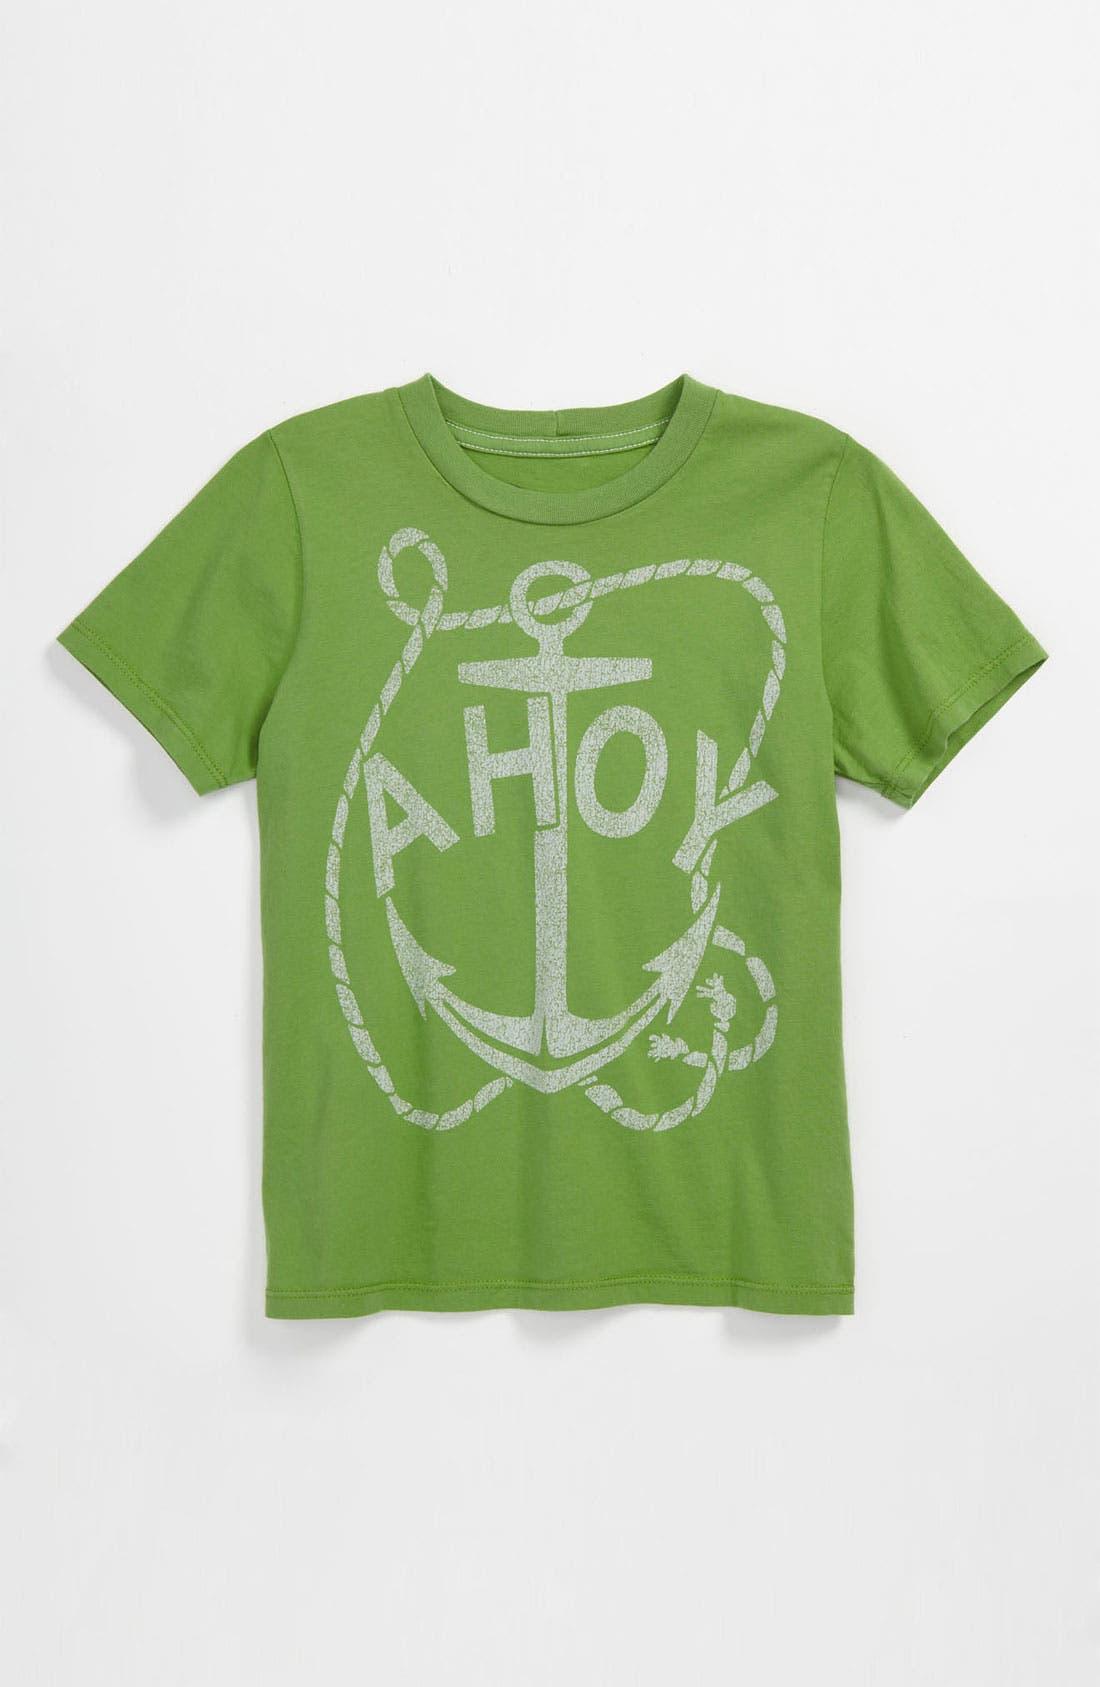 Main Image - Peek 'Ahoy' T-Shirt (Toddler, Little Boys & Big Boys)